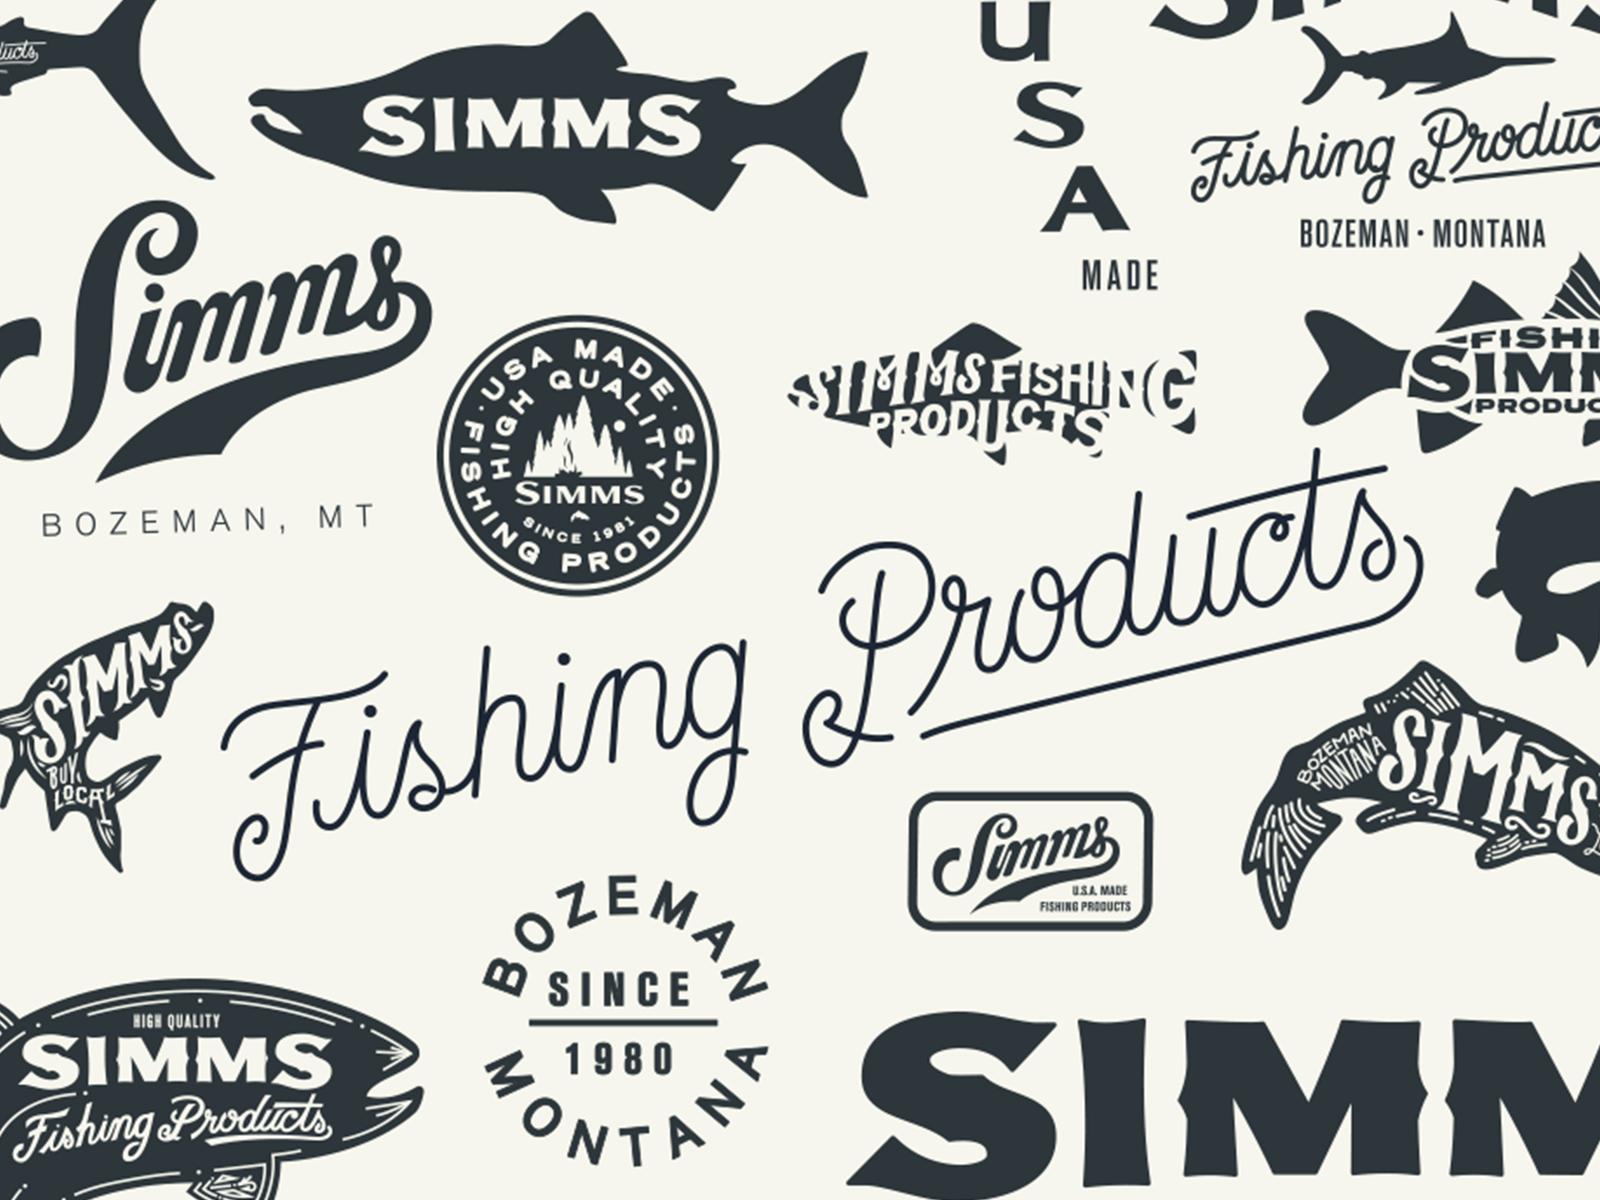 Simms fishing 1